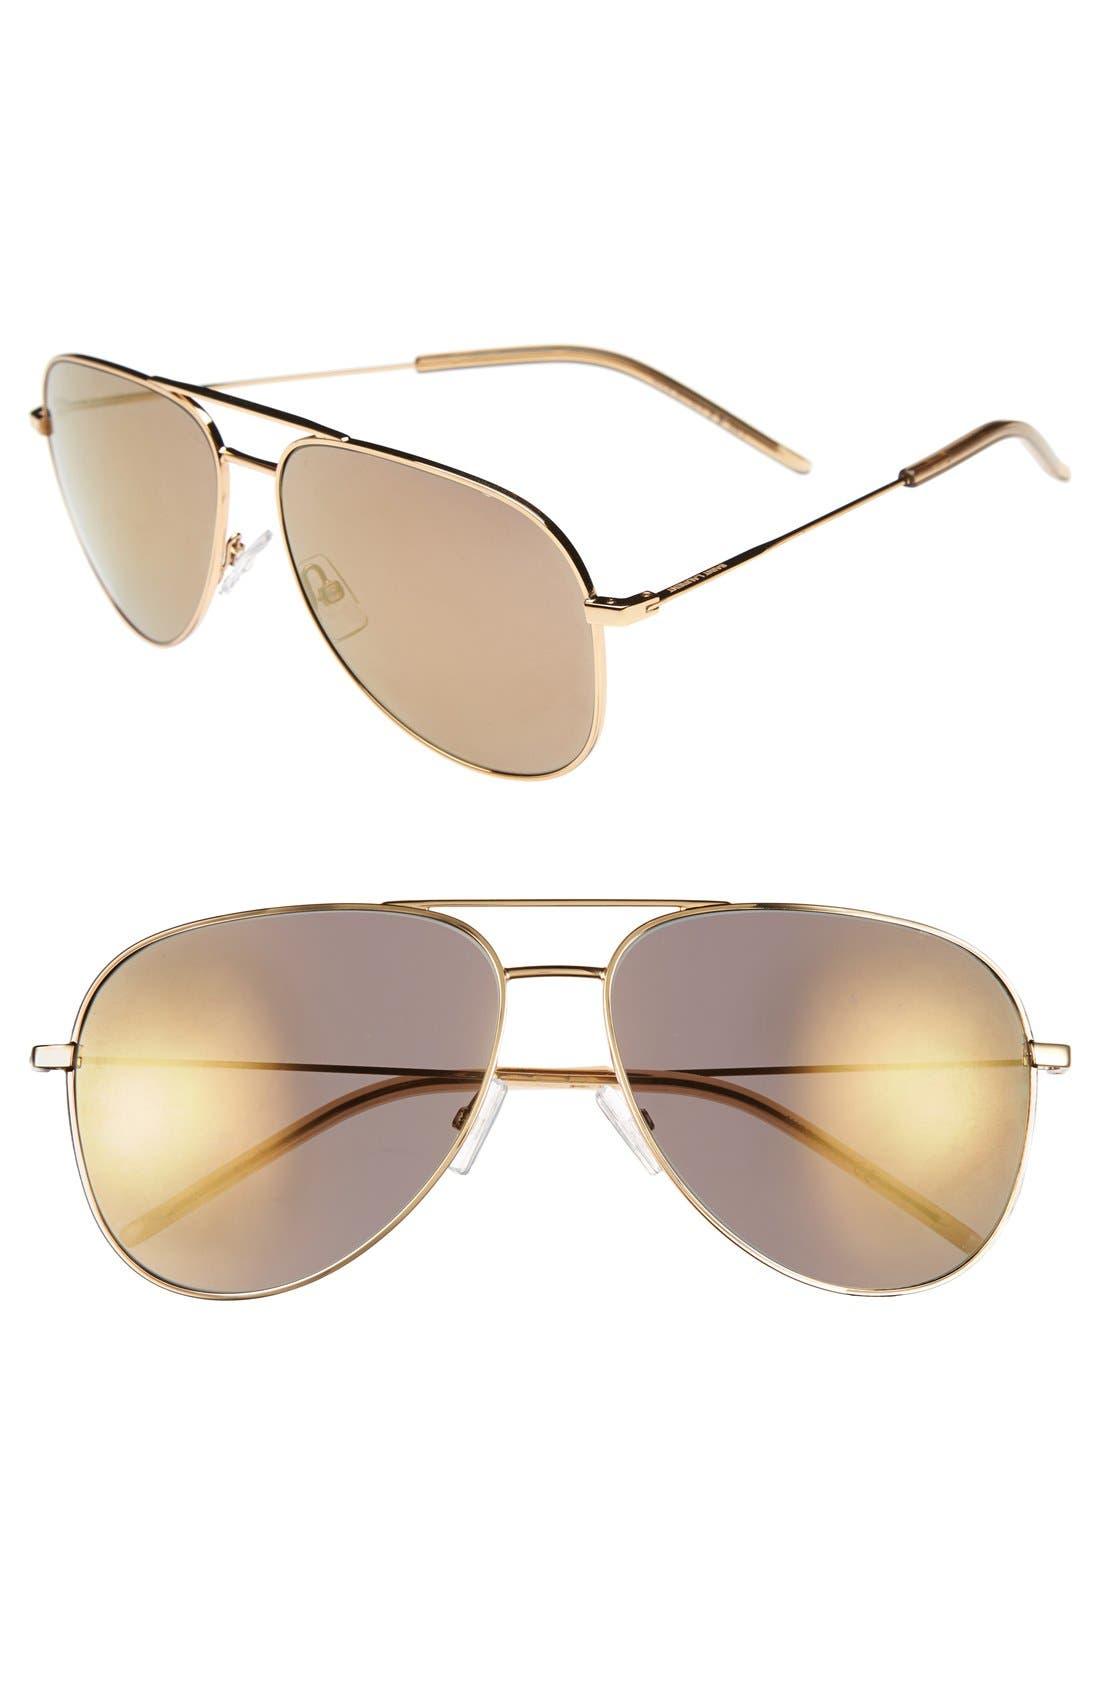 Alternate Image 1 Selected - Saint Laurent 59mm Aviator Sunglasses